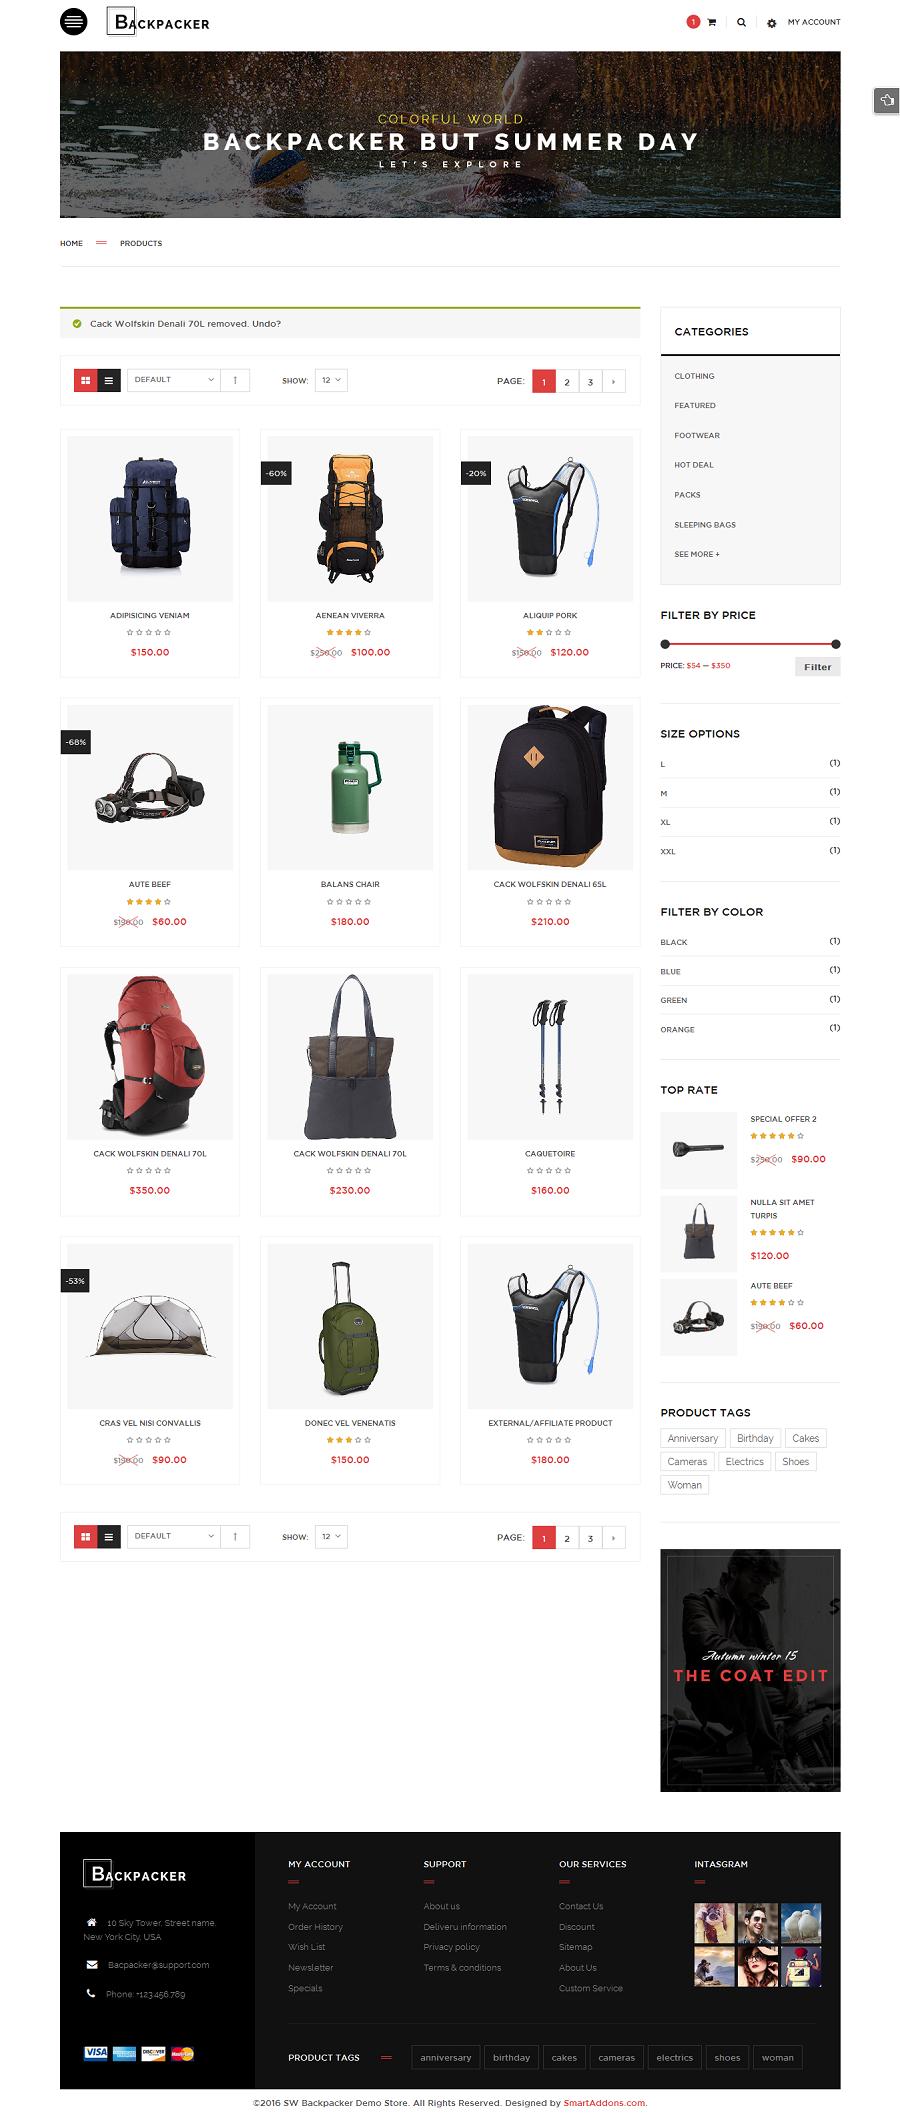 backpacker responsive woocommerce wordpress theme by. Black Bedroom Furniture Sets. Home Design Ideas